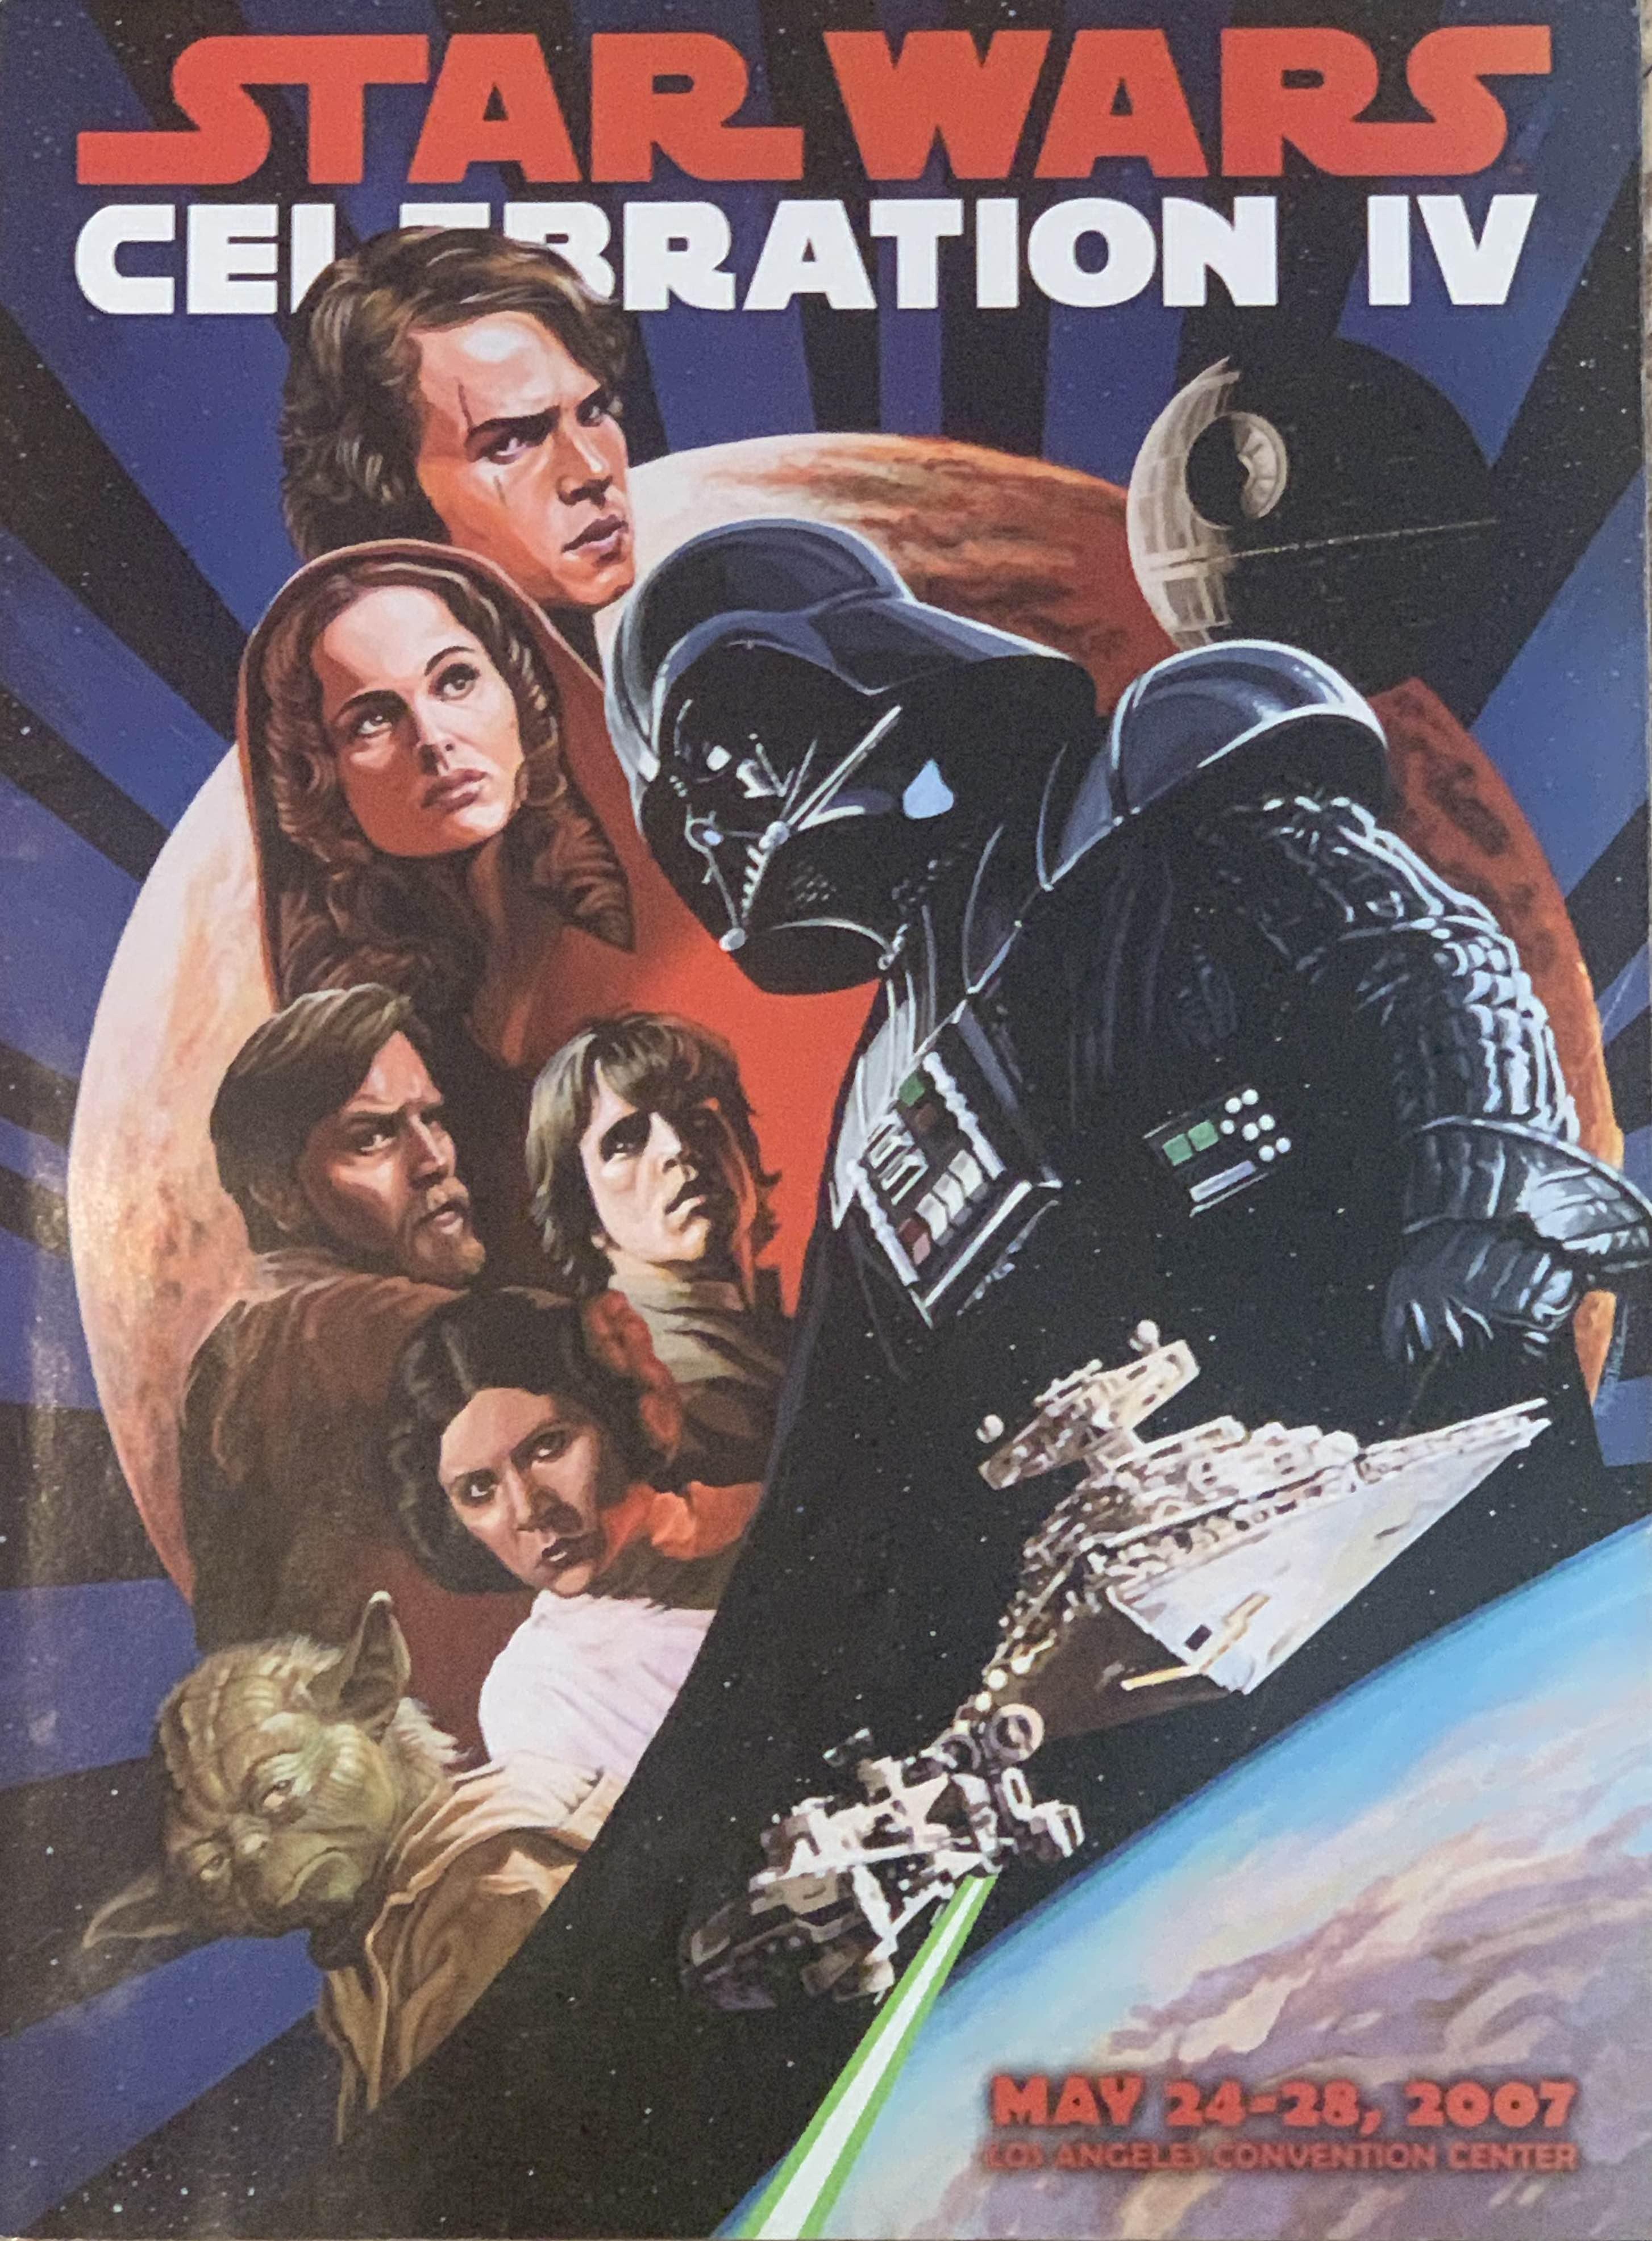 Star Wars Celebration IV Souvenir Program